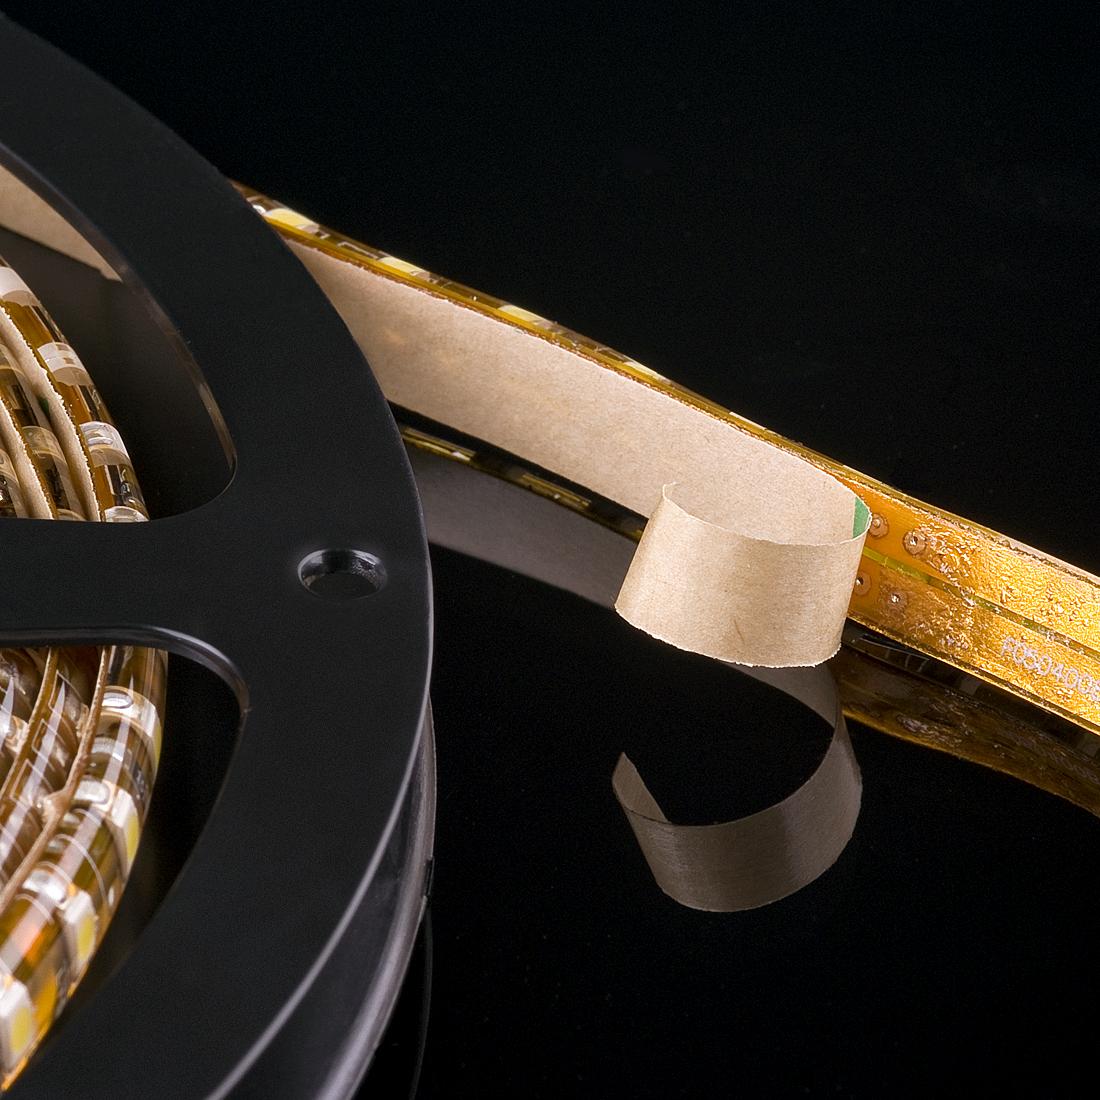 led streifen 150 tri chip au en 5m wei 2550lm ip64 ebay. Black Bedroom Furniture Sets. Home Design Ideas